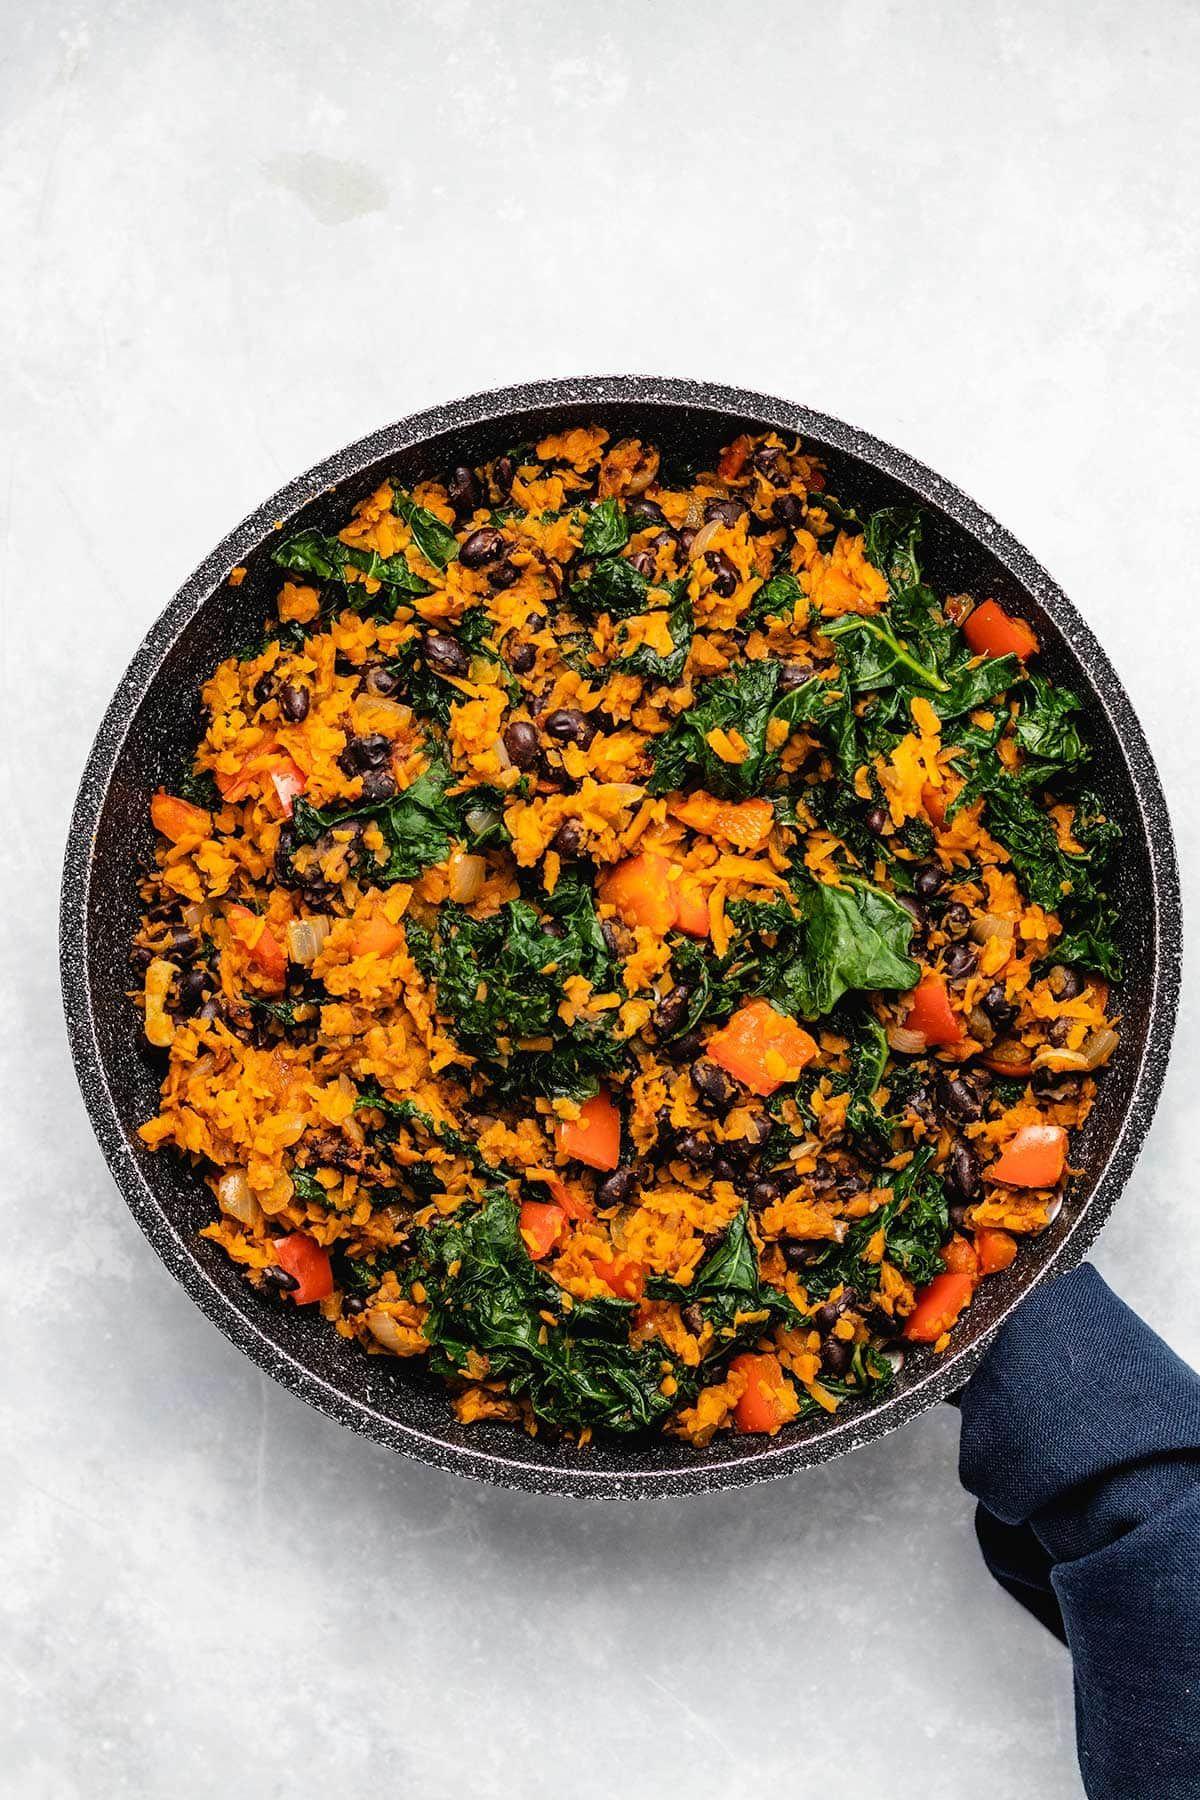 Southwest Sweet Potato Kale Black Bean Skillet Recipe In 2020 Sweet Potato Kale Sweet Potato Kale Hash Kale